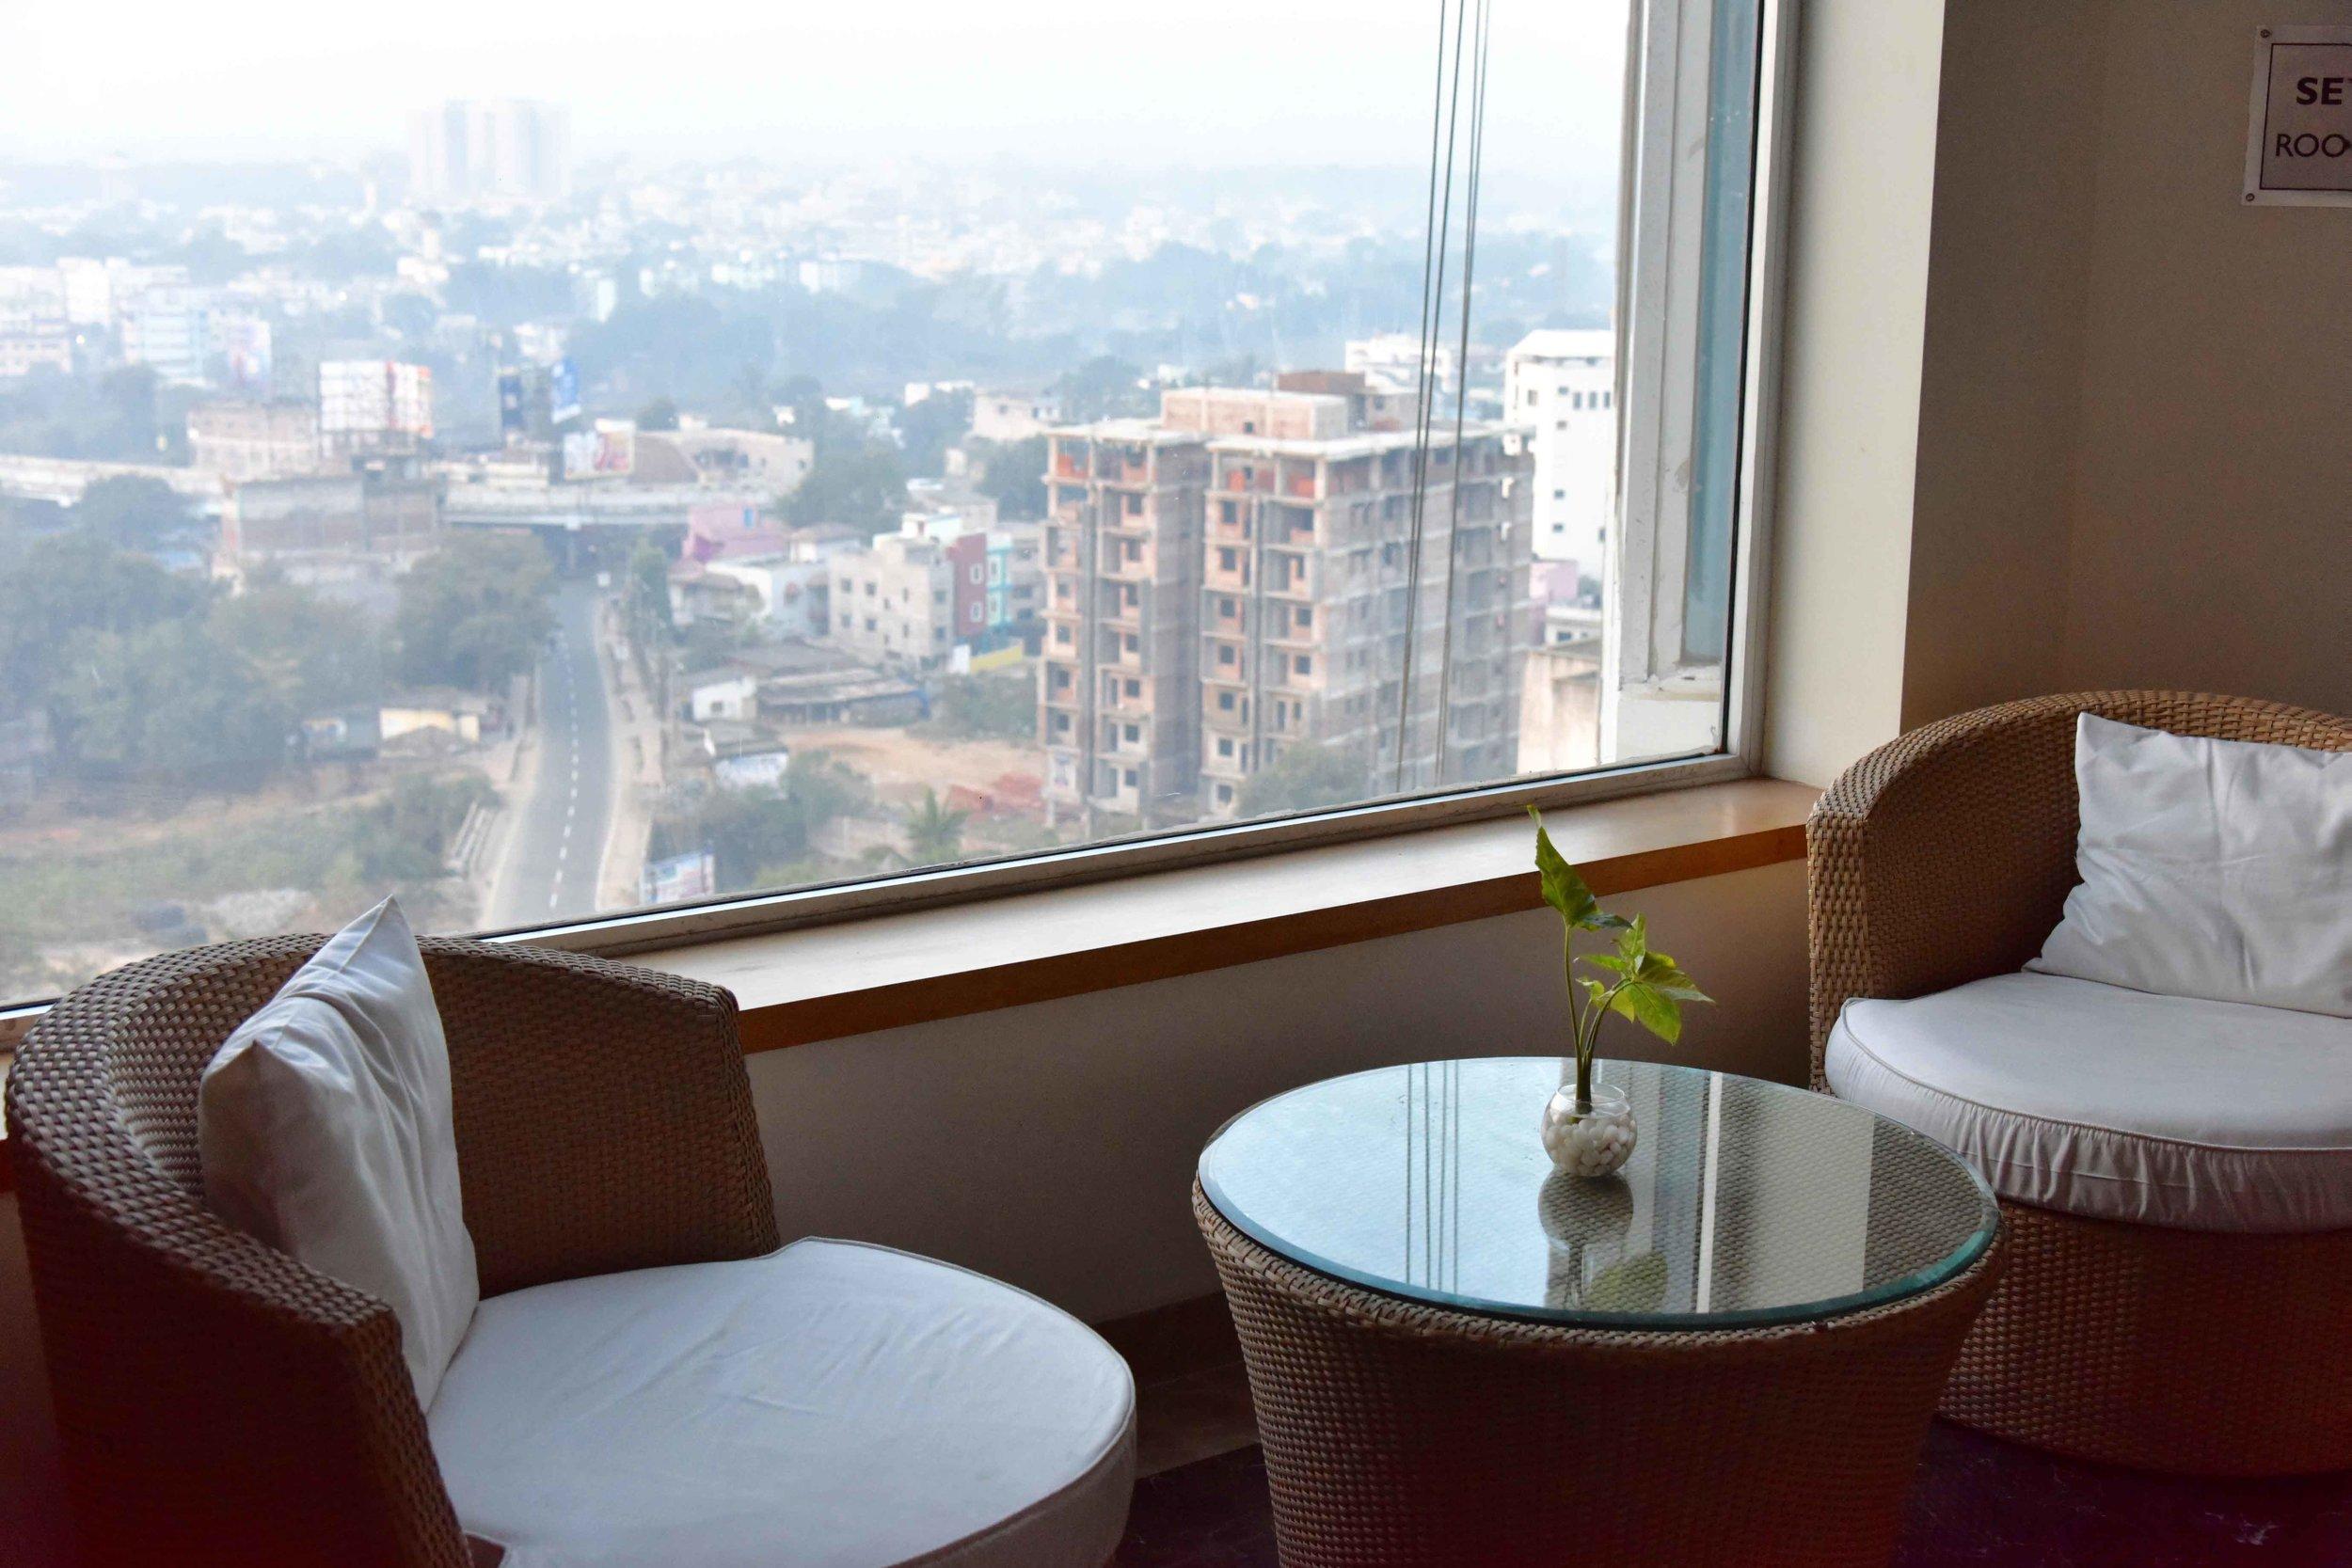 Radisson Blu Hotel, Ranchi, Jharkhand, India. Image©sourcingstyle.com.